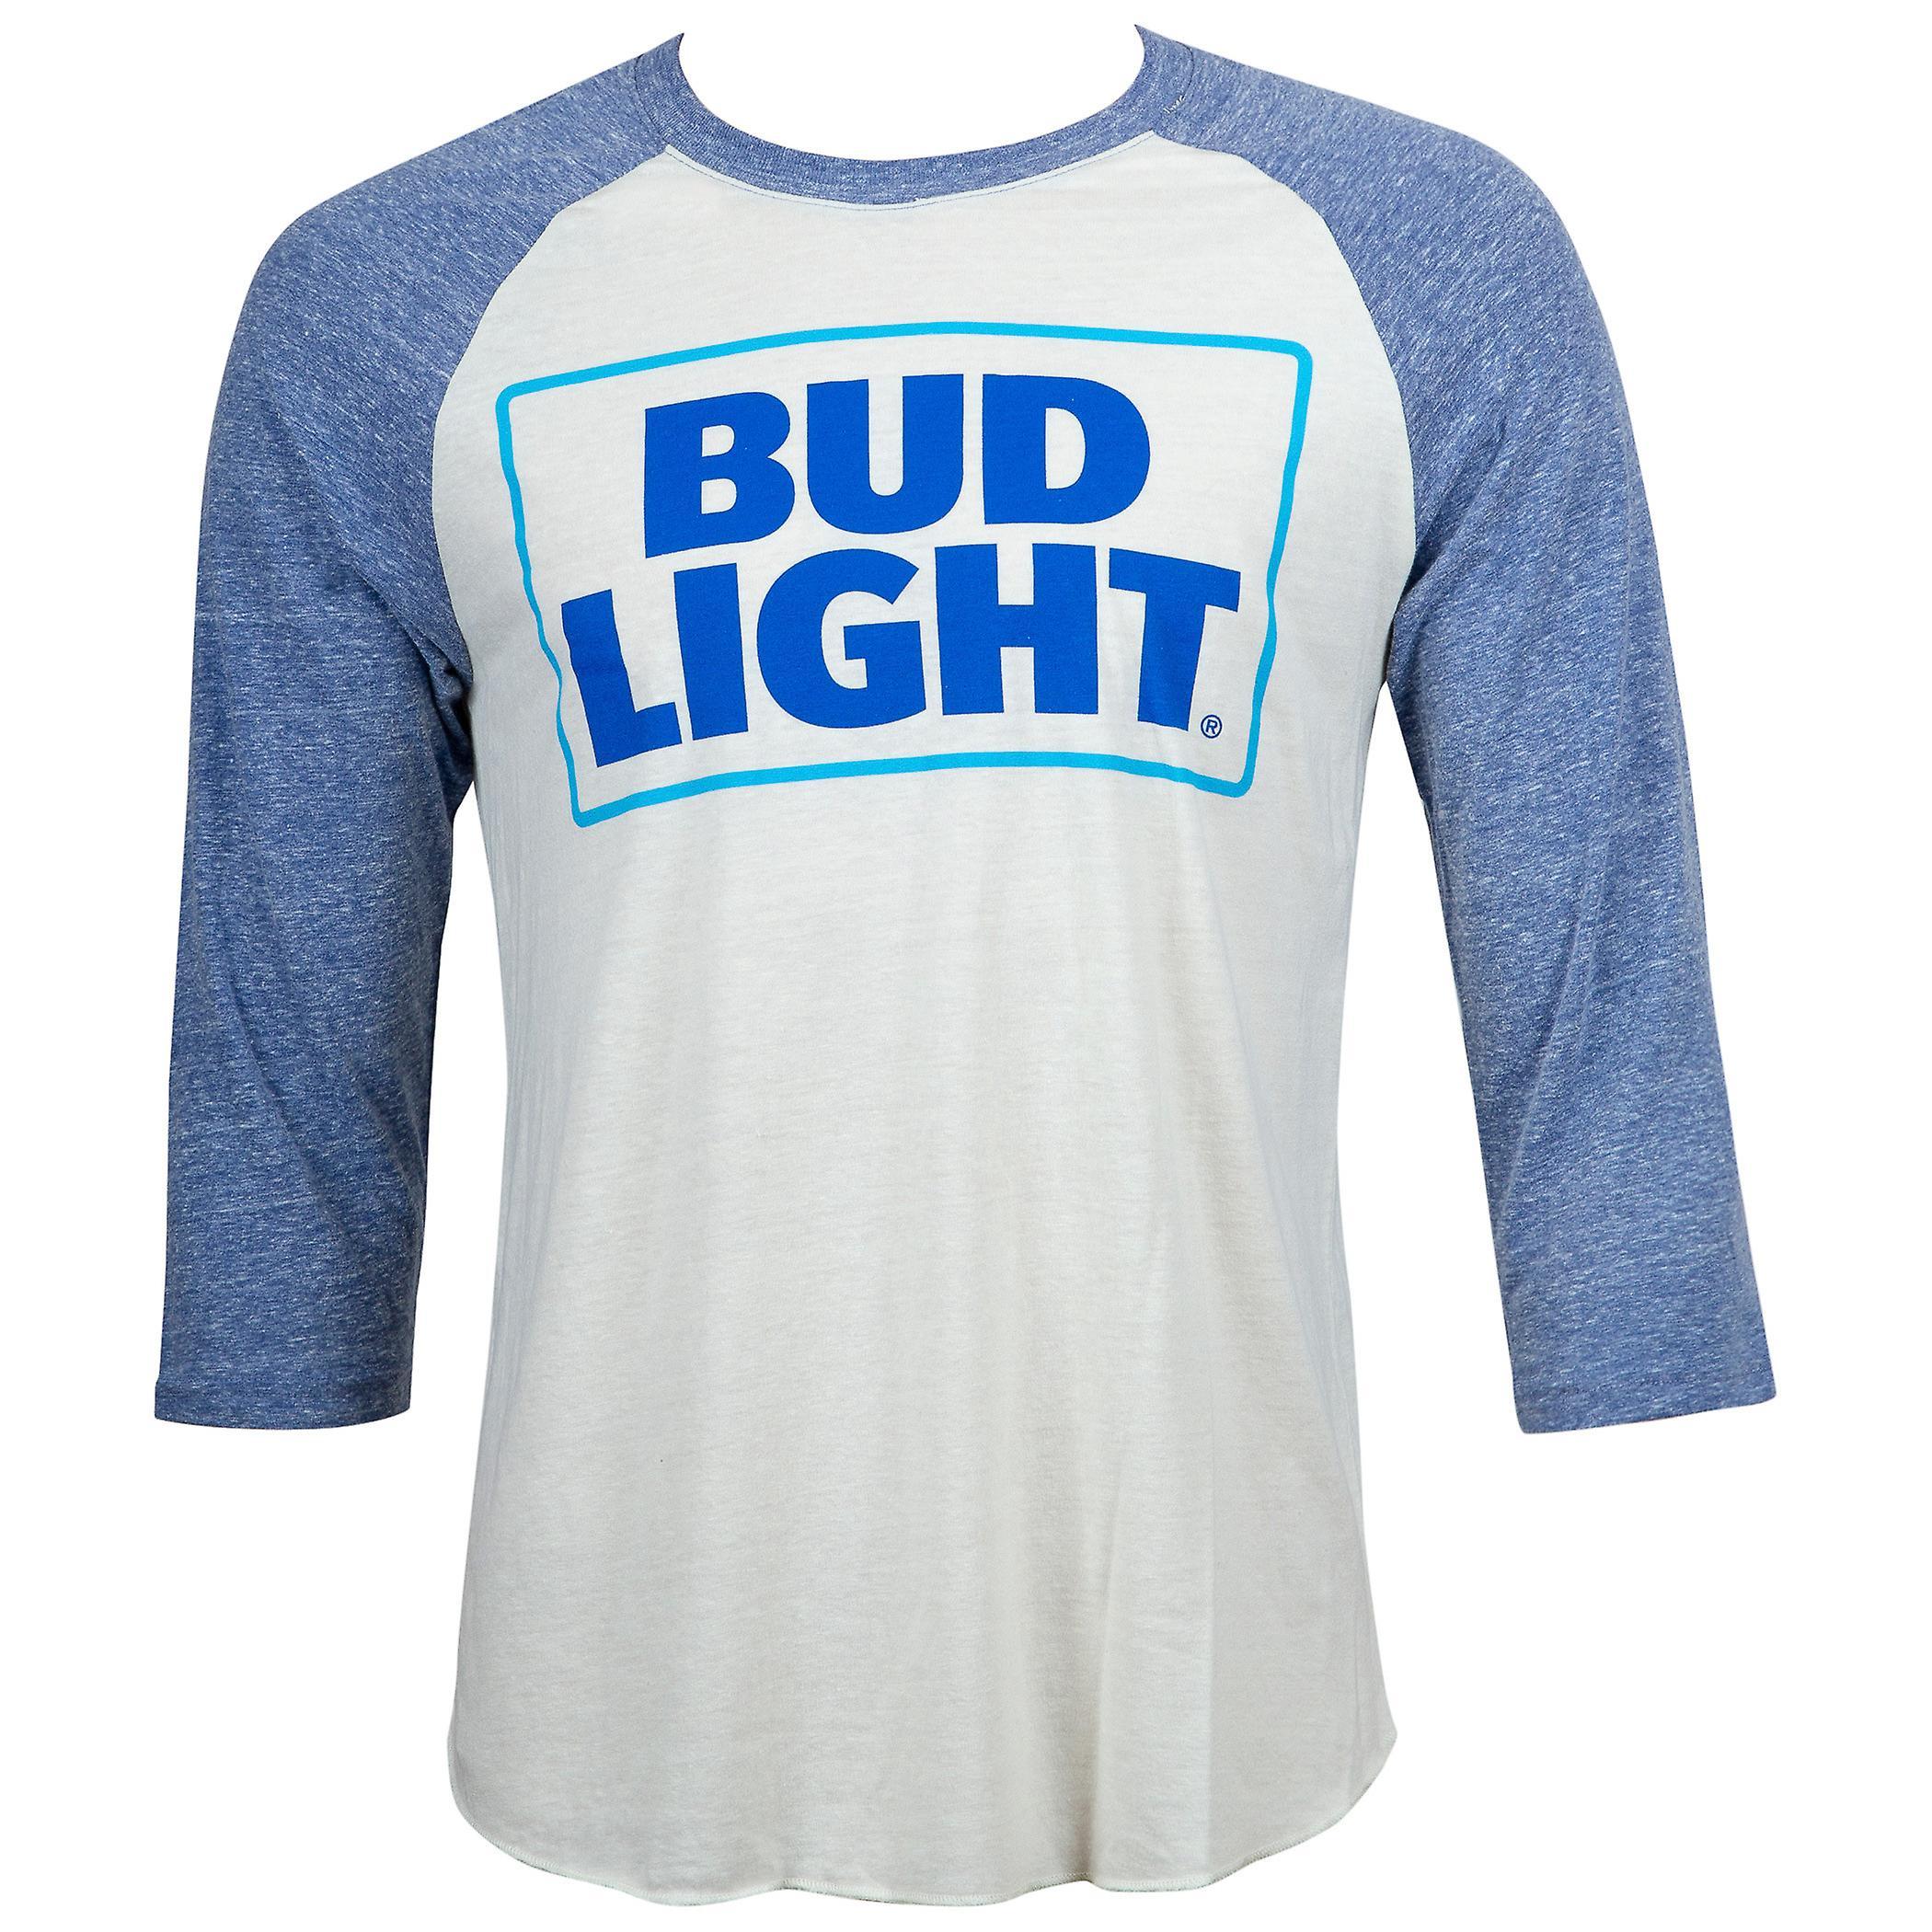 Grey Marl Crew T-shirts Mens Medium. Beer ***NEW*** Coors Light